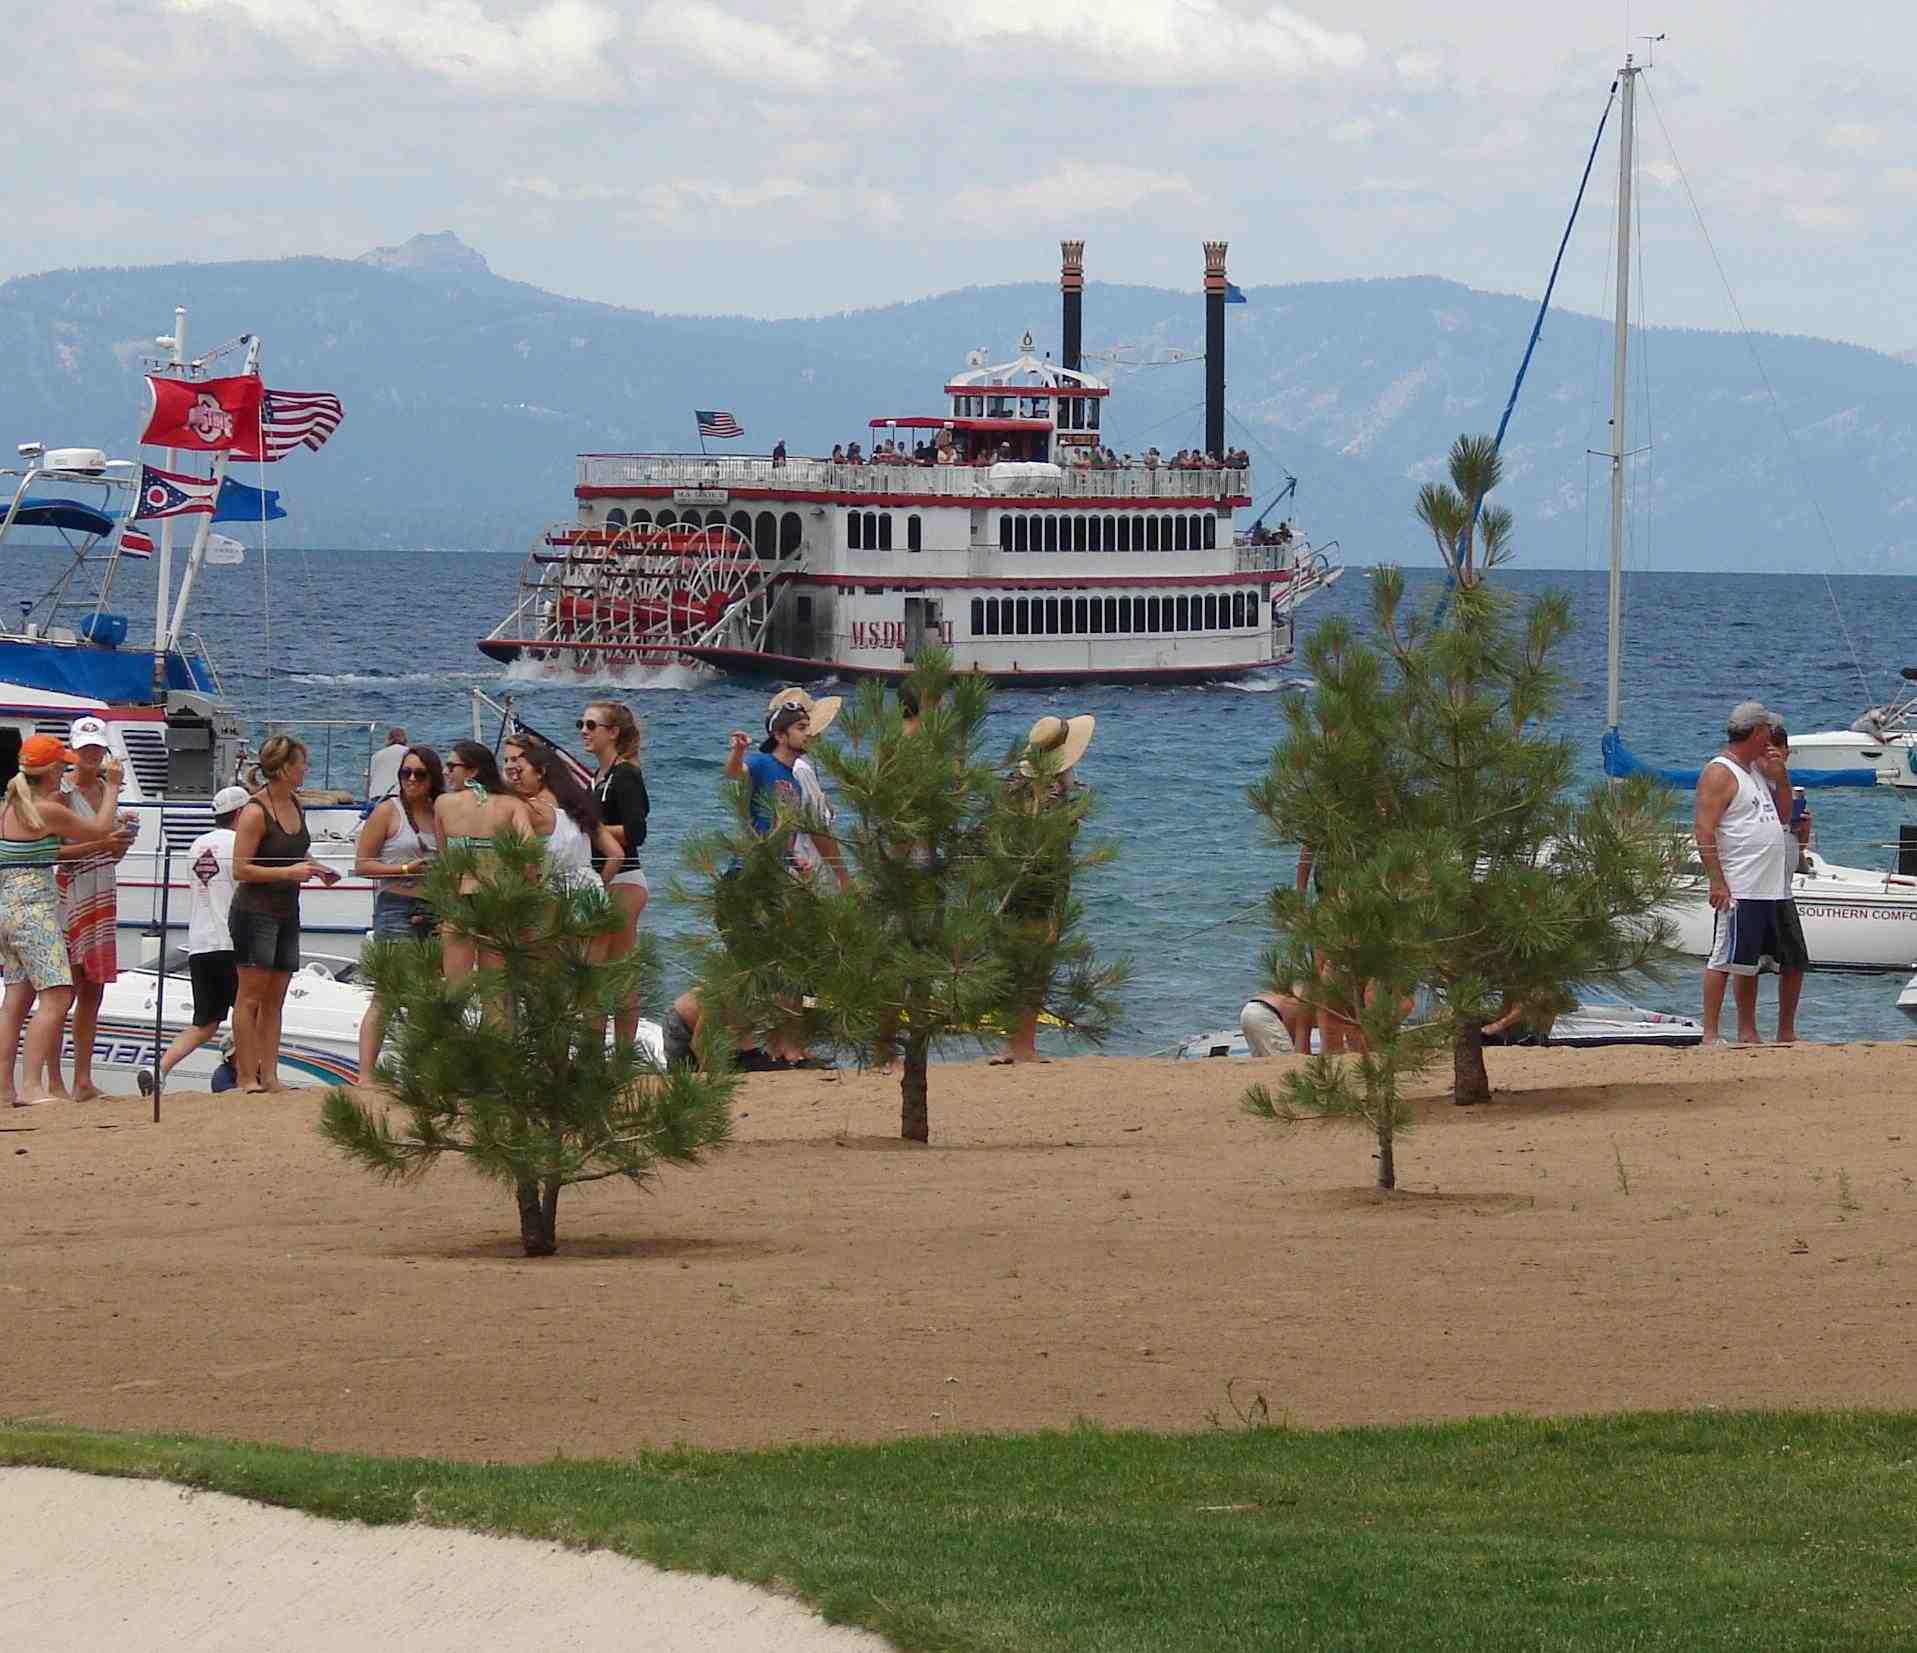 MS Dixie on Lake Tahoe